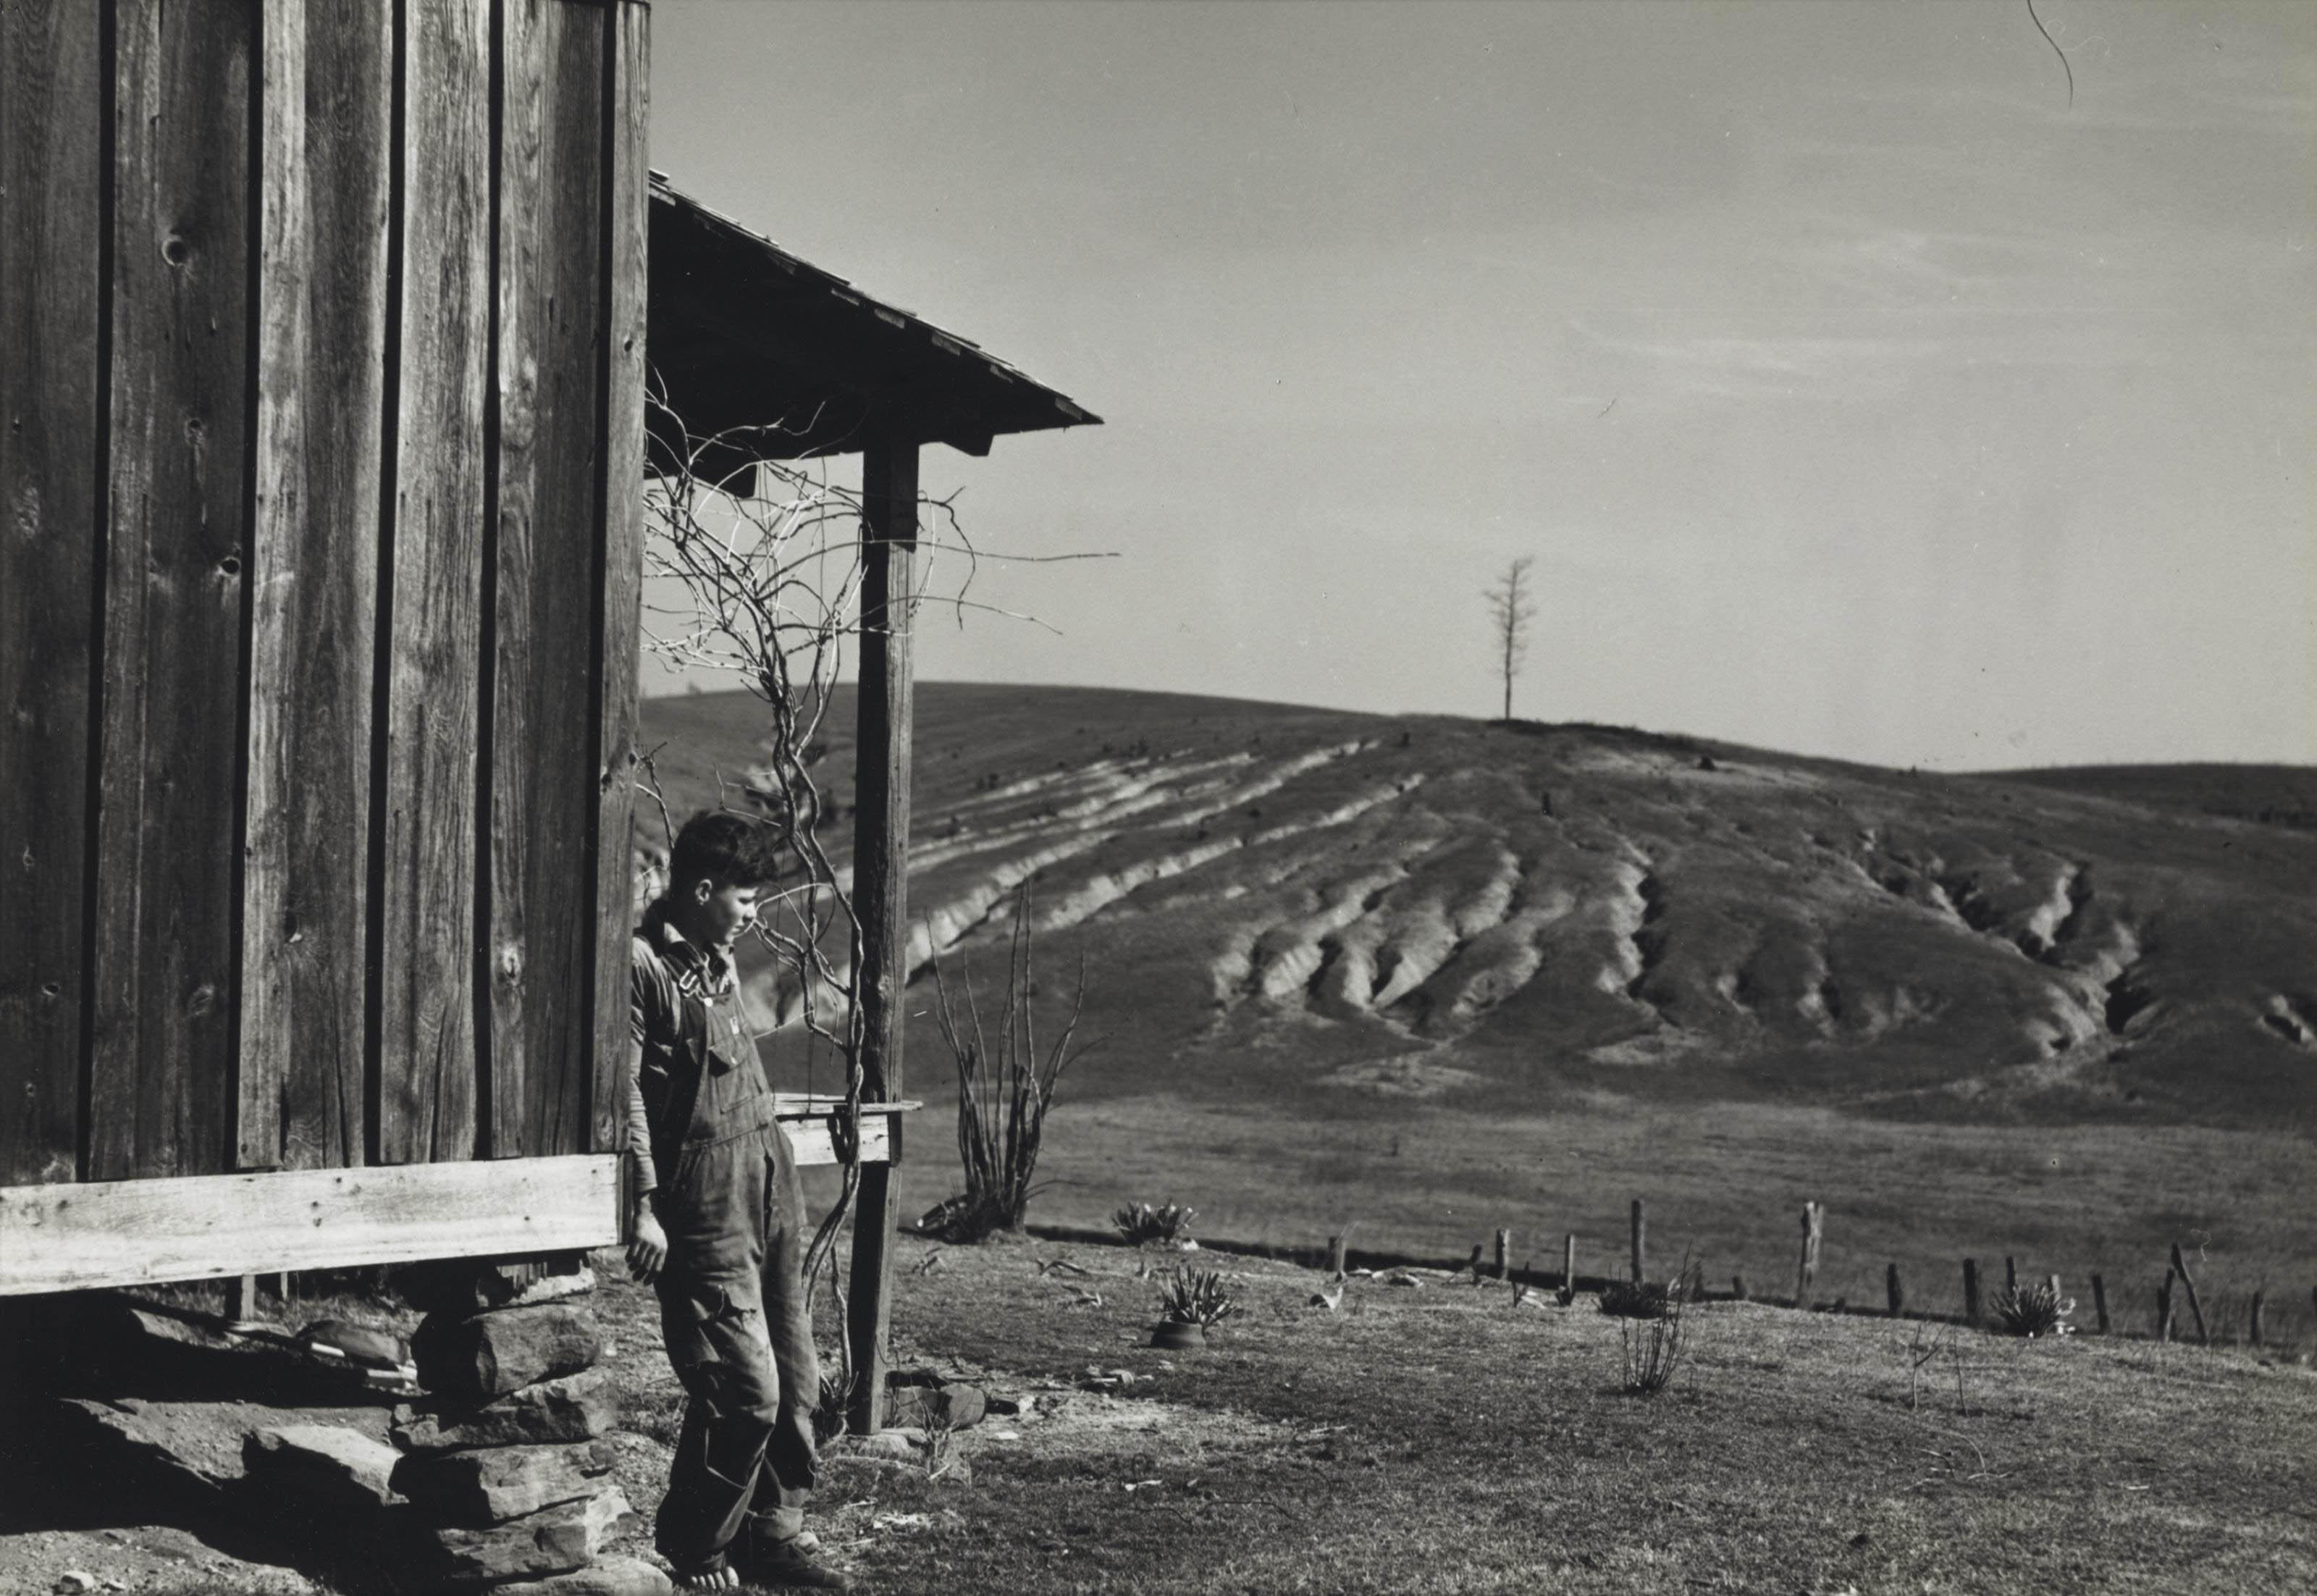 Oklahoma, c. 1939